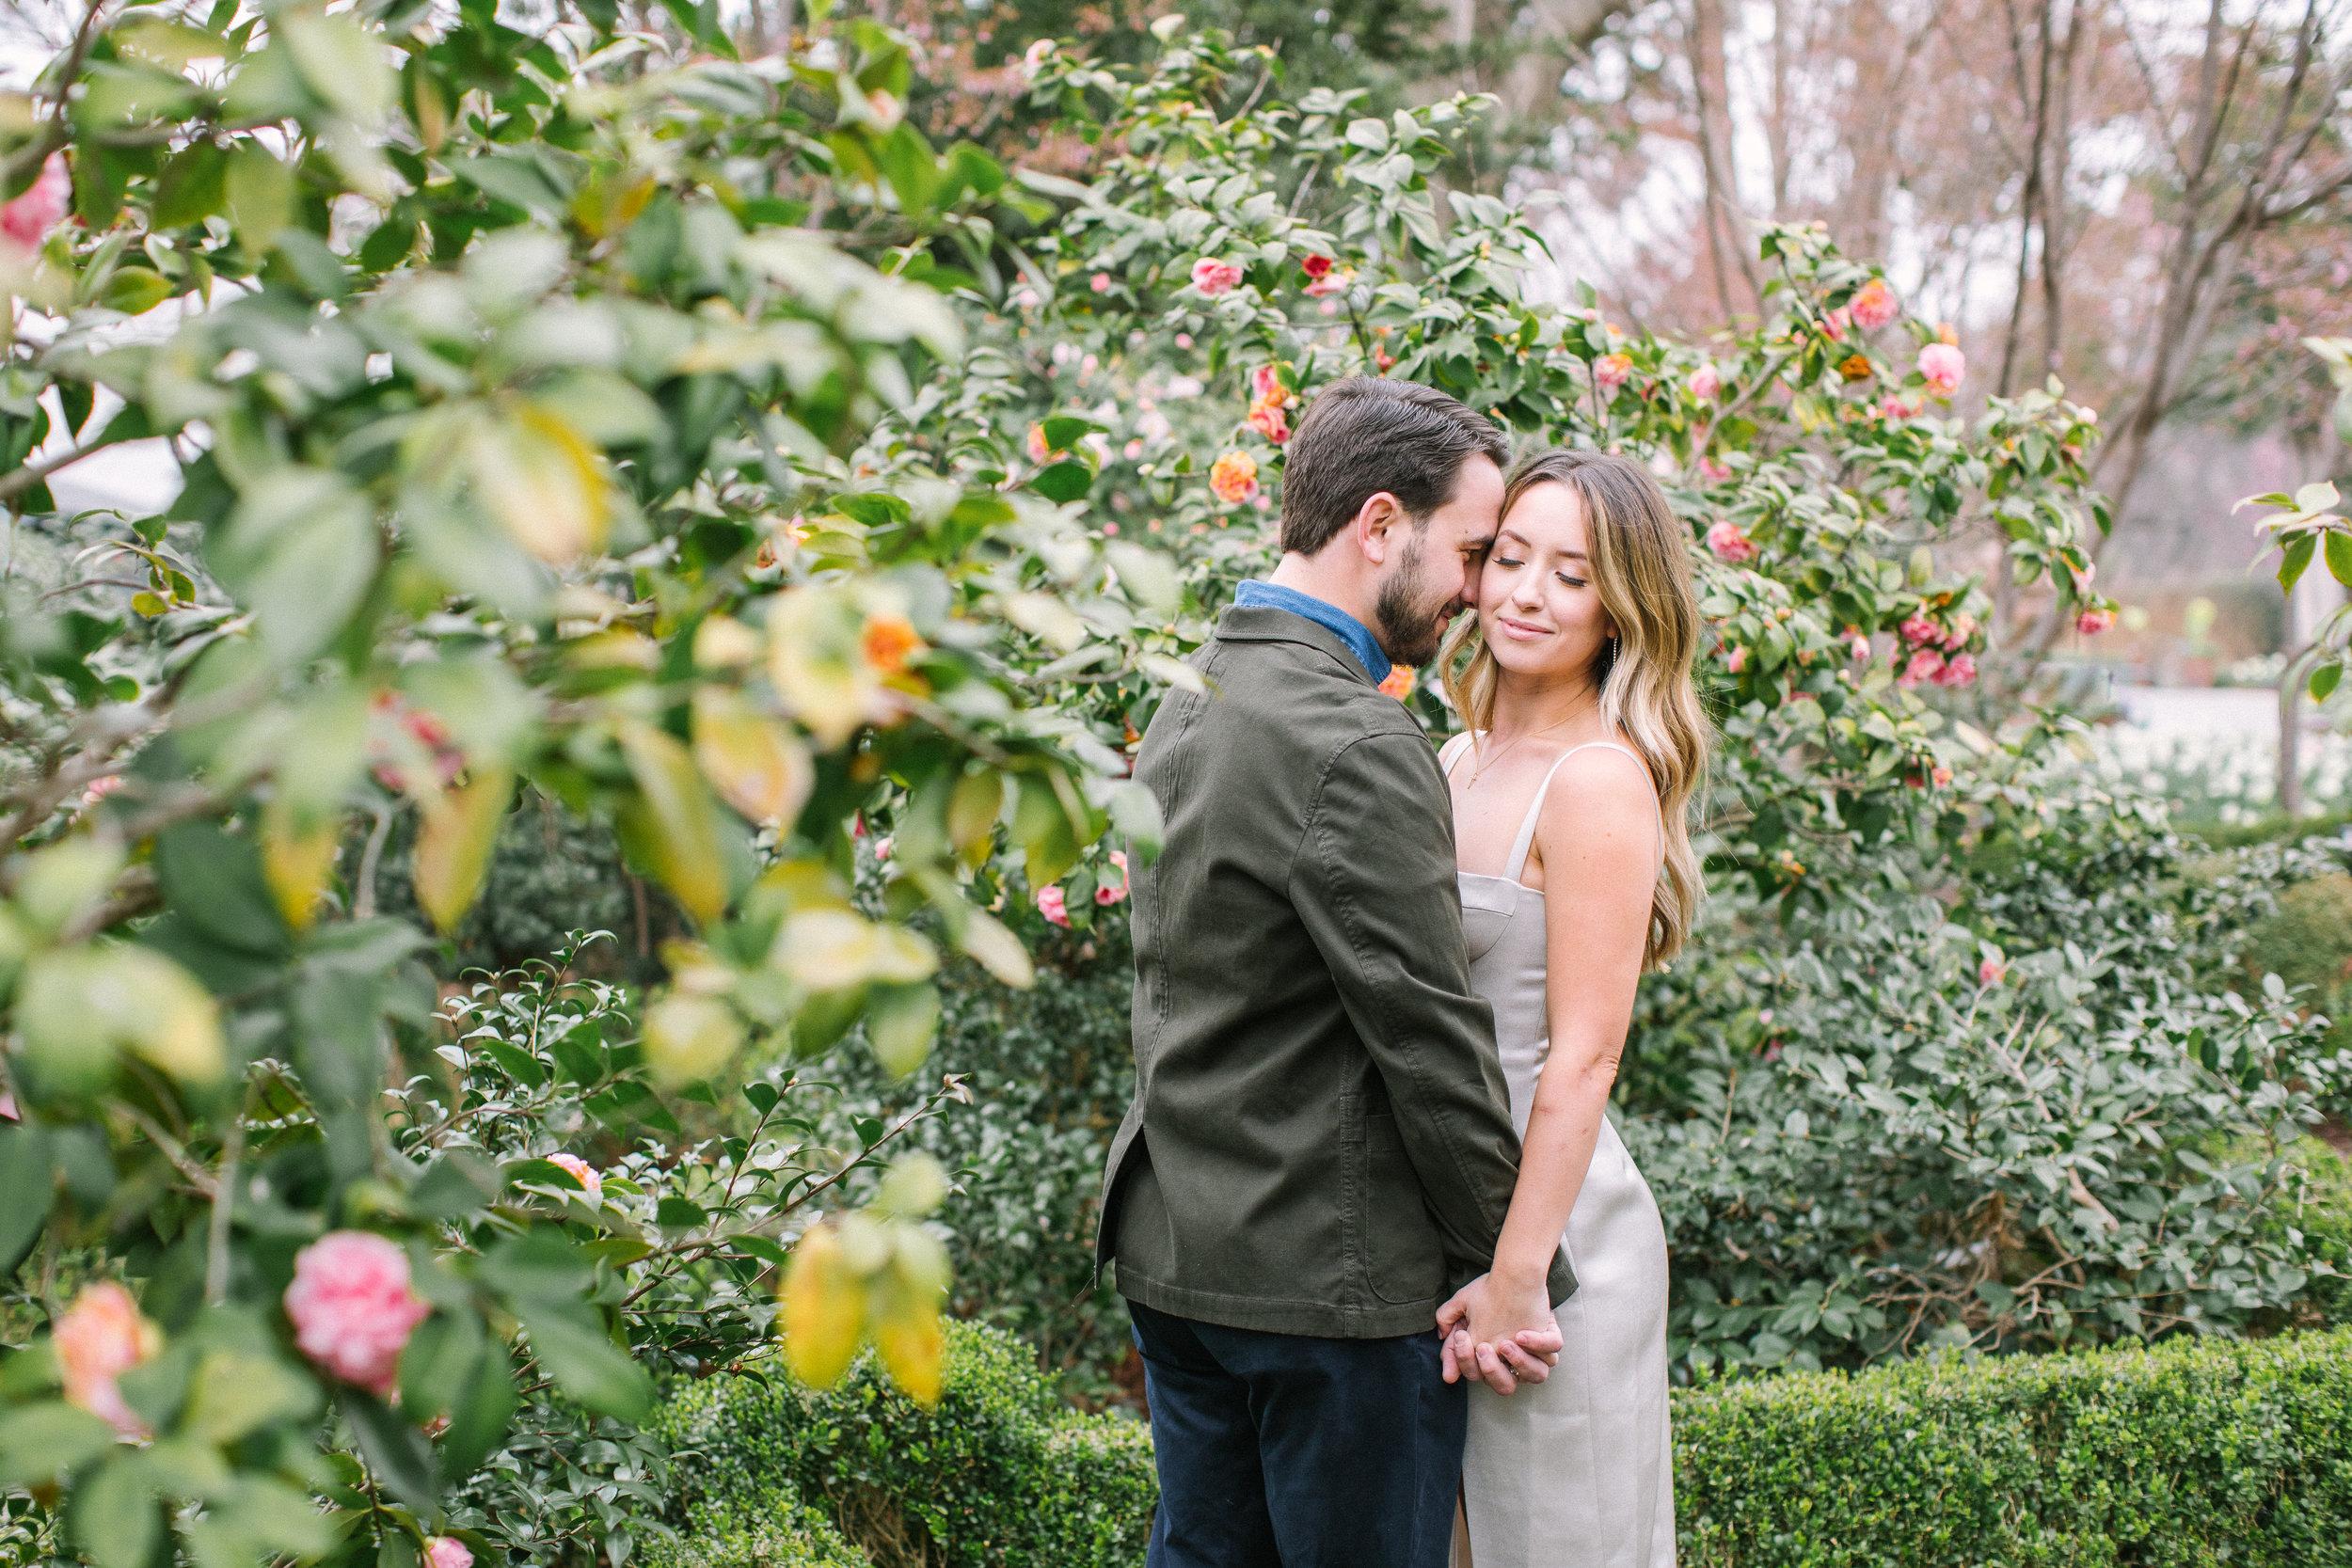 Ellen-Ashton-Photography-Dallas-wedding-photographers-Girt-and-Gold-Weddings-Dallas-Wedding-planners15.jpg